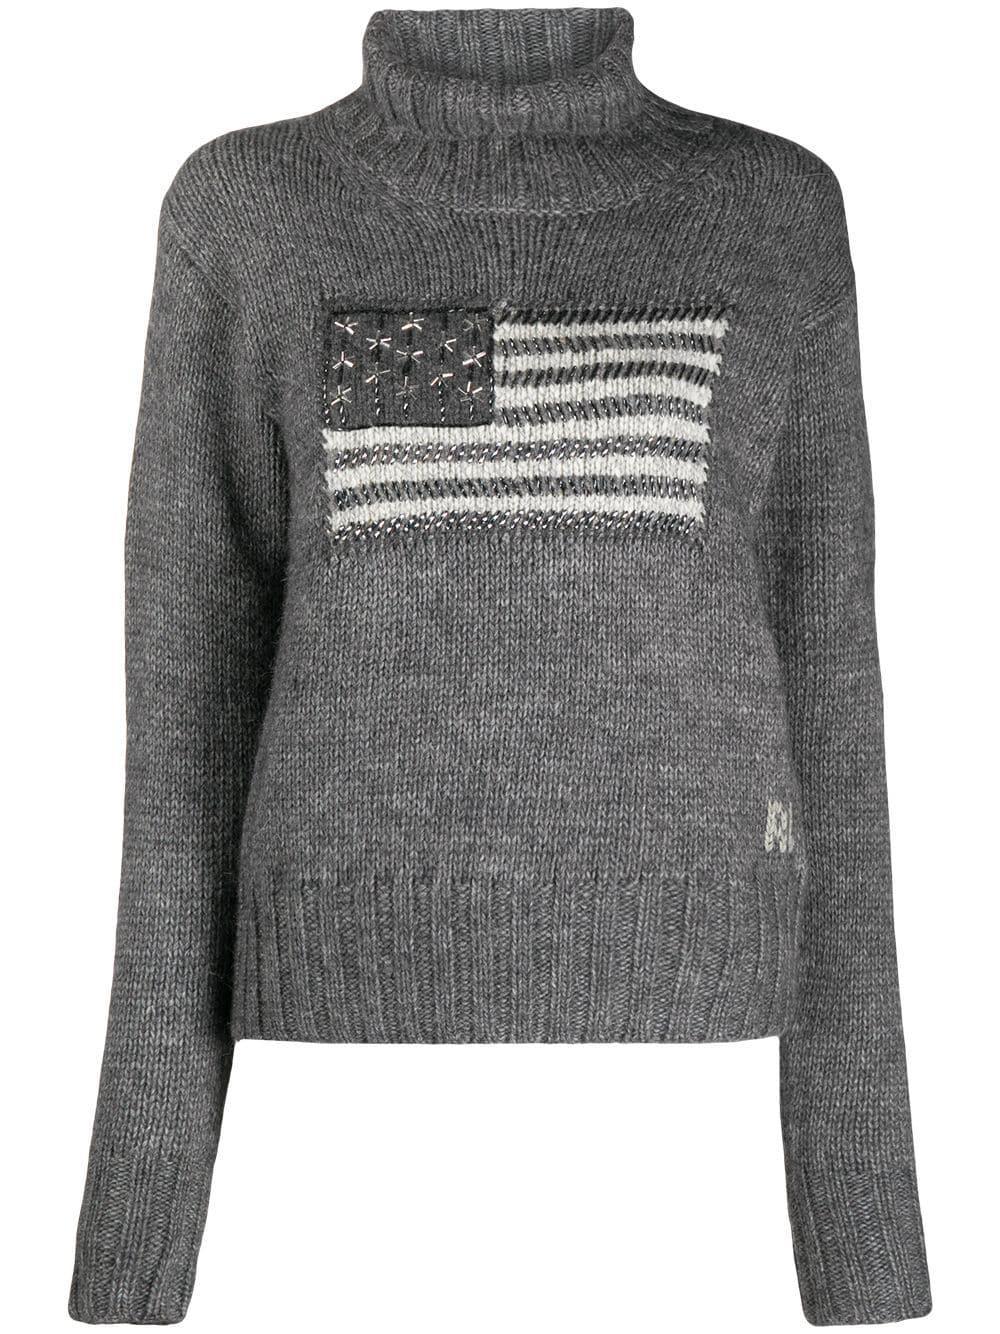 American Flag Sweater Item # 211815108001